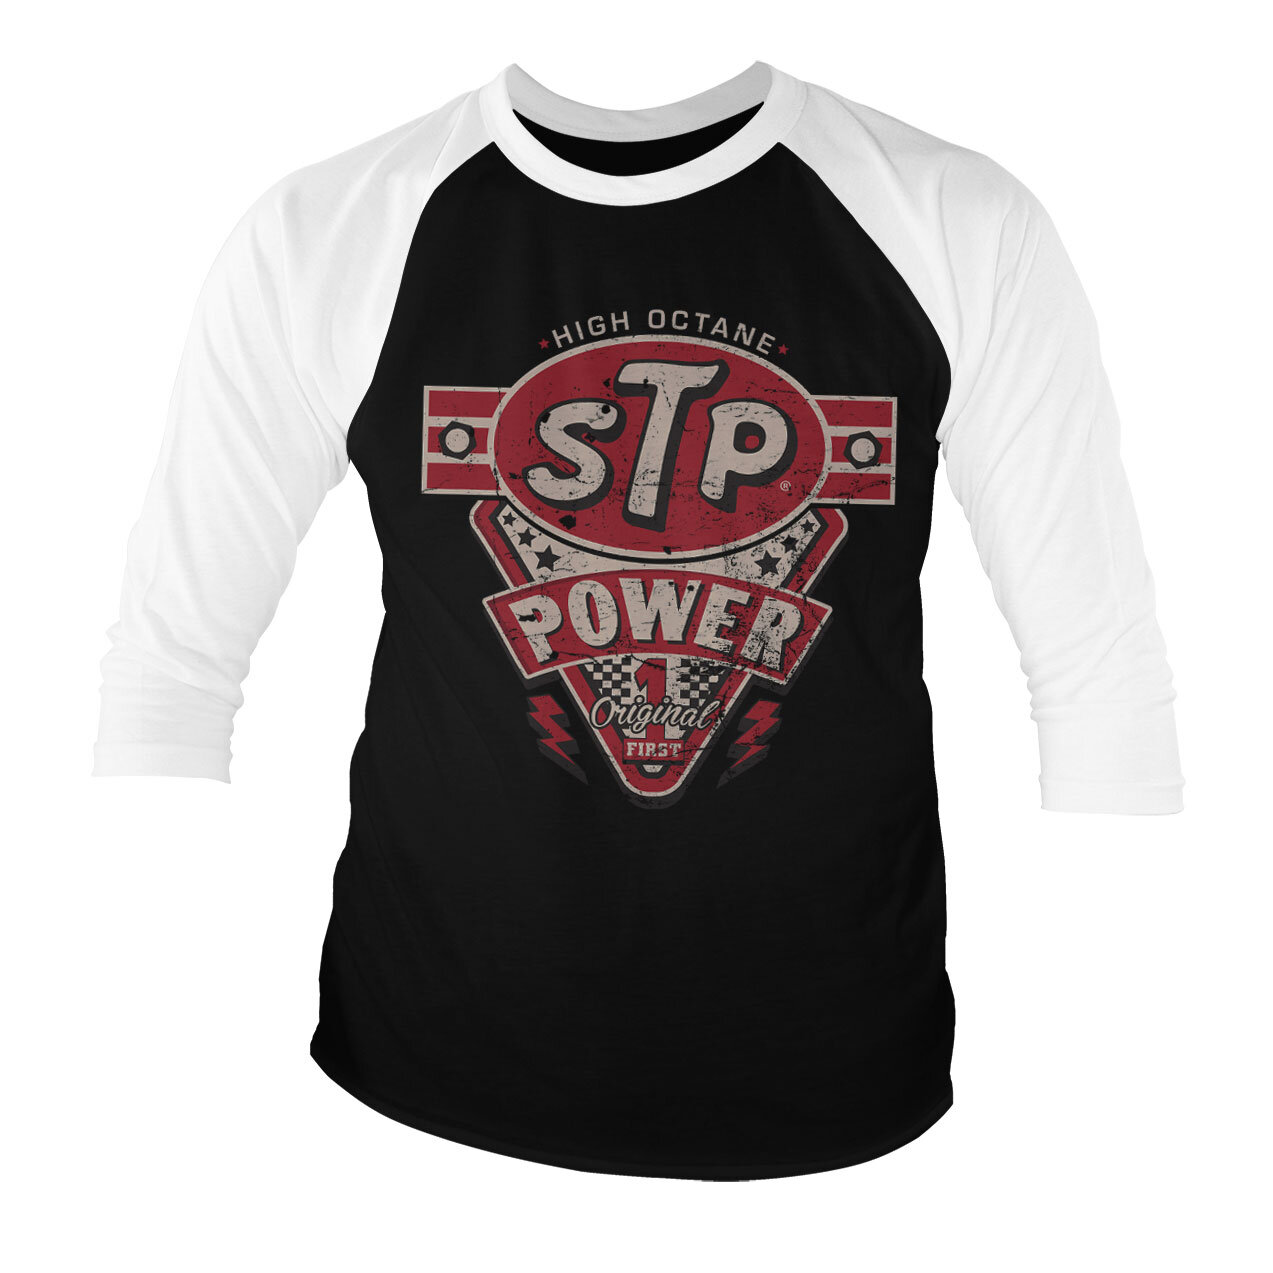 STP Power Baseball 3/4 Sleeve Tee